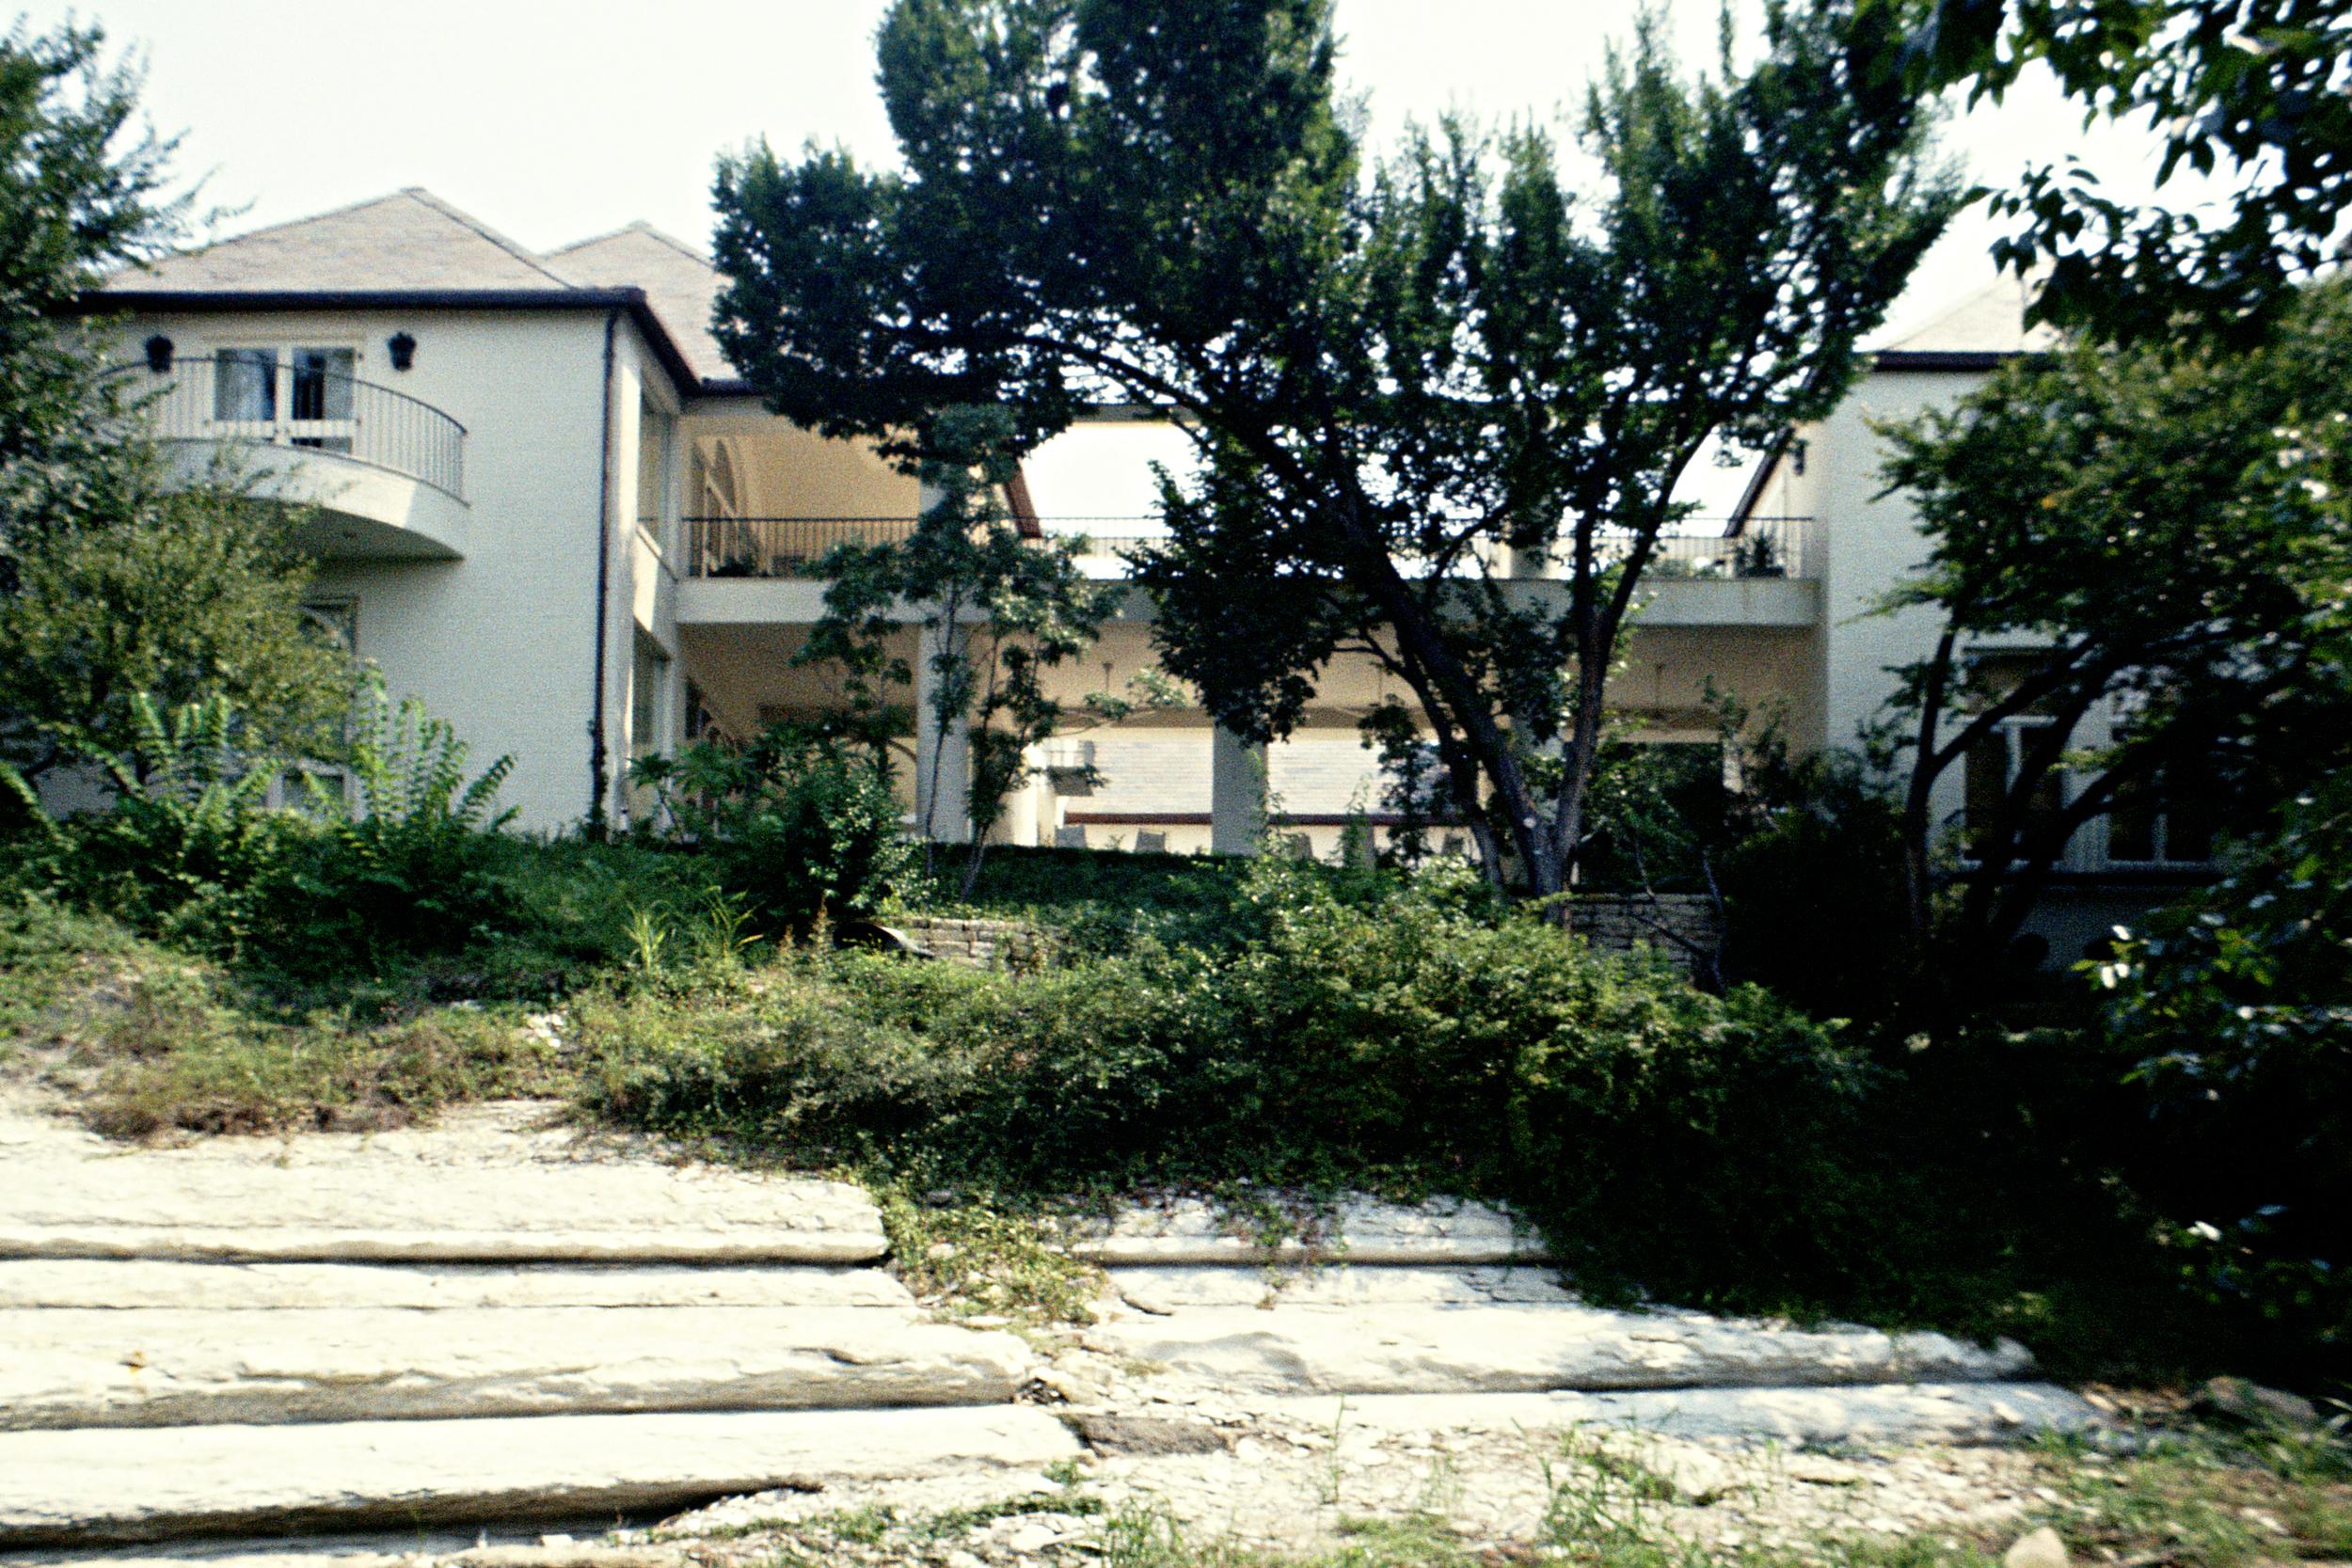 10573 Inwood - Rauscher Residence